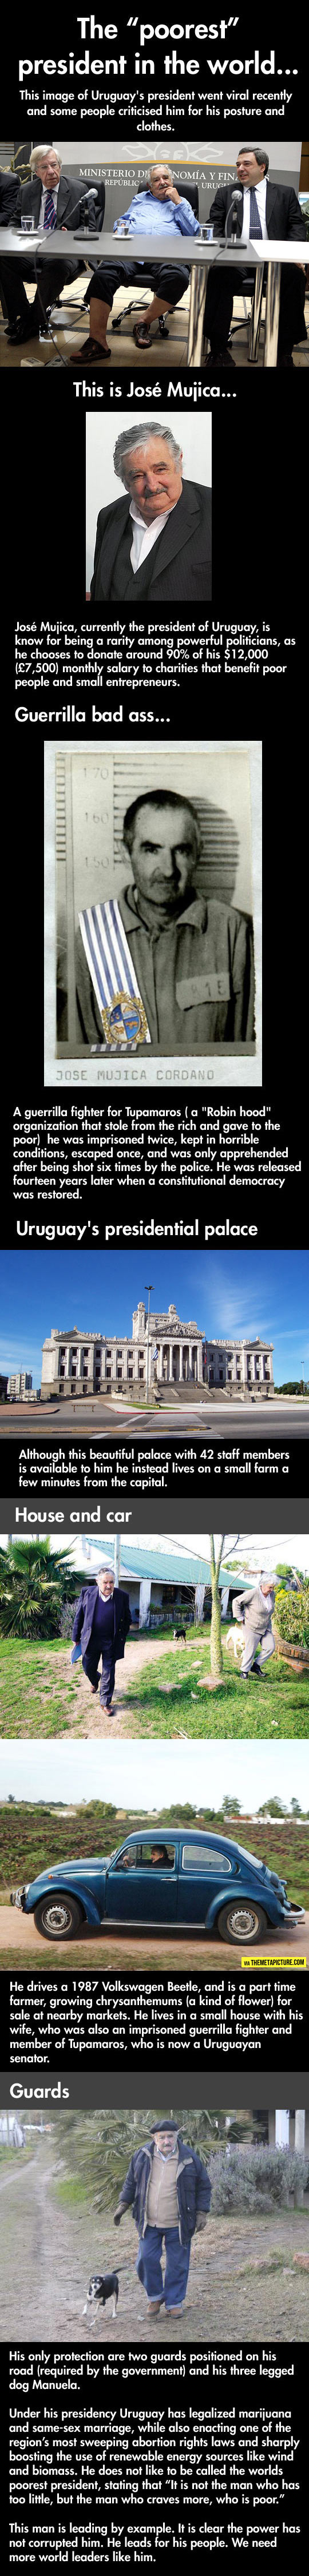 funny-president-of-Uruguay-poor-man